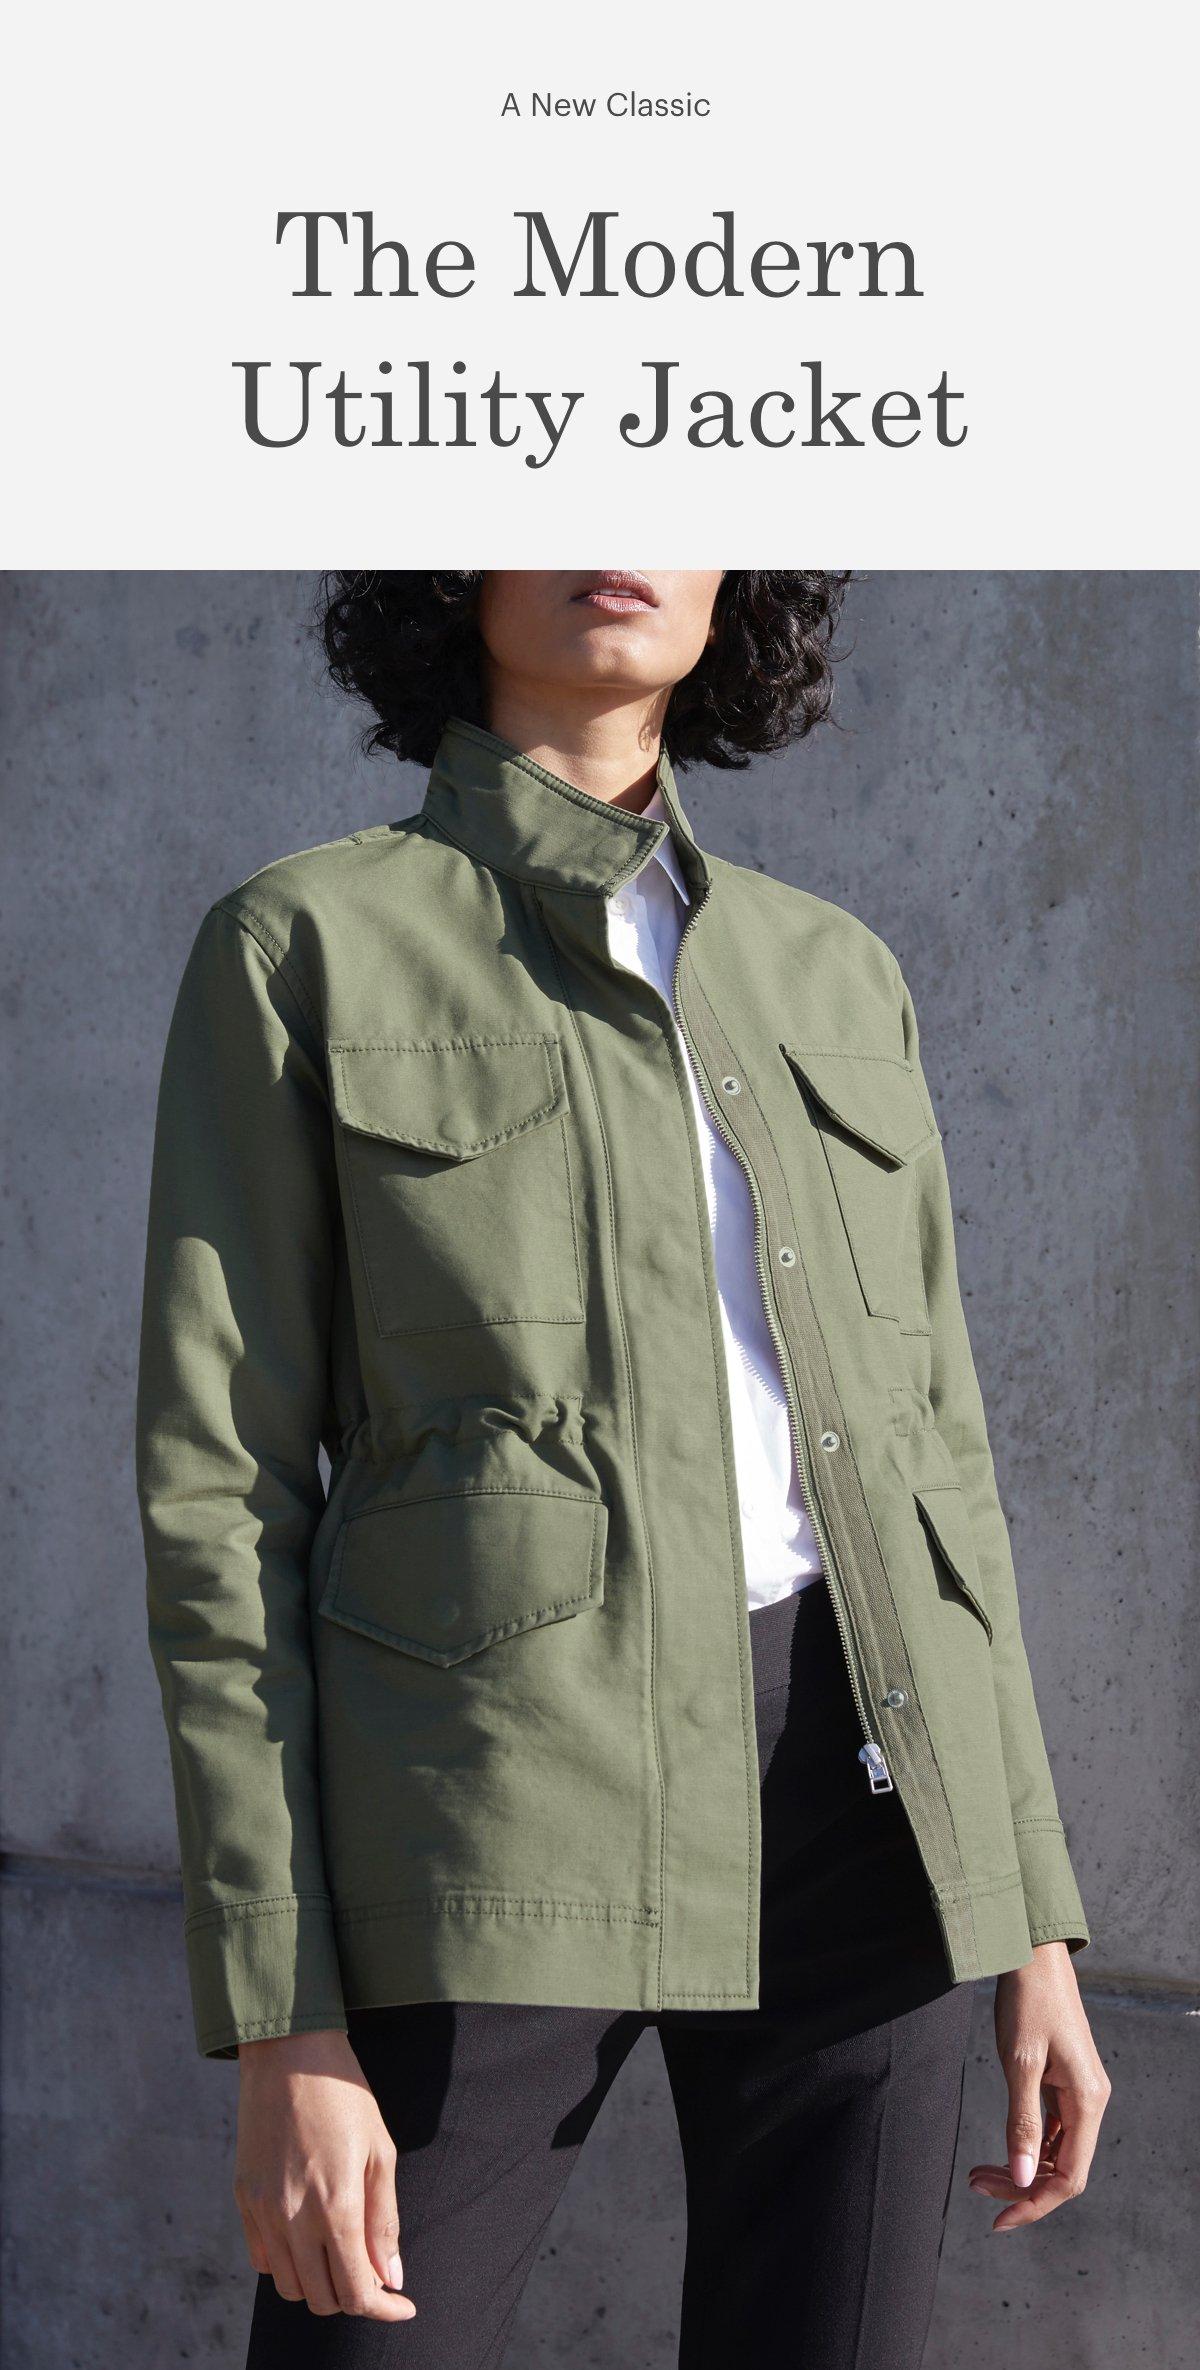 The Modern Utility Jacket